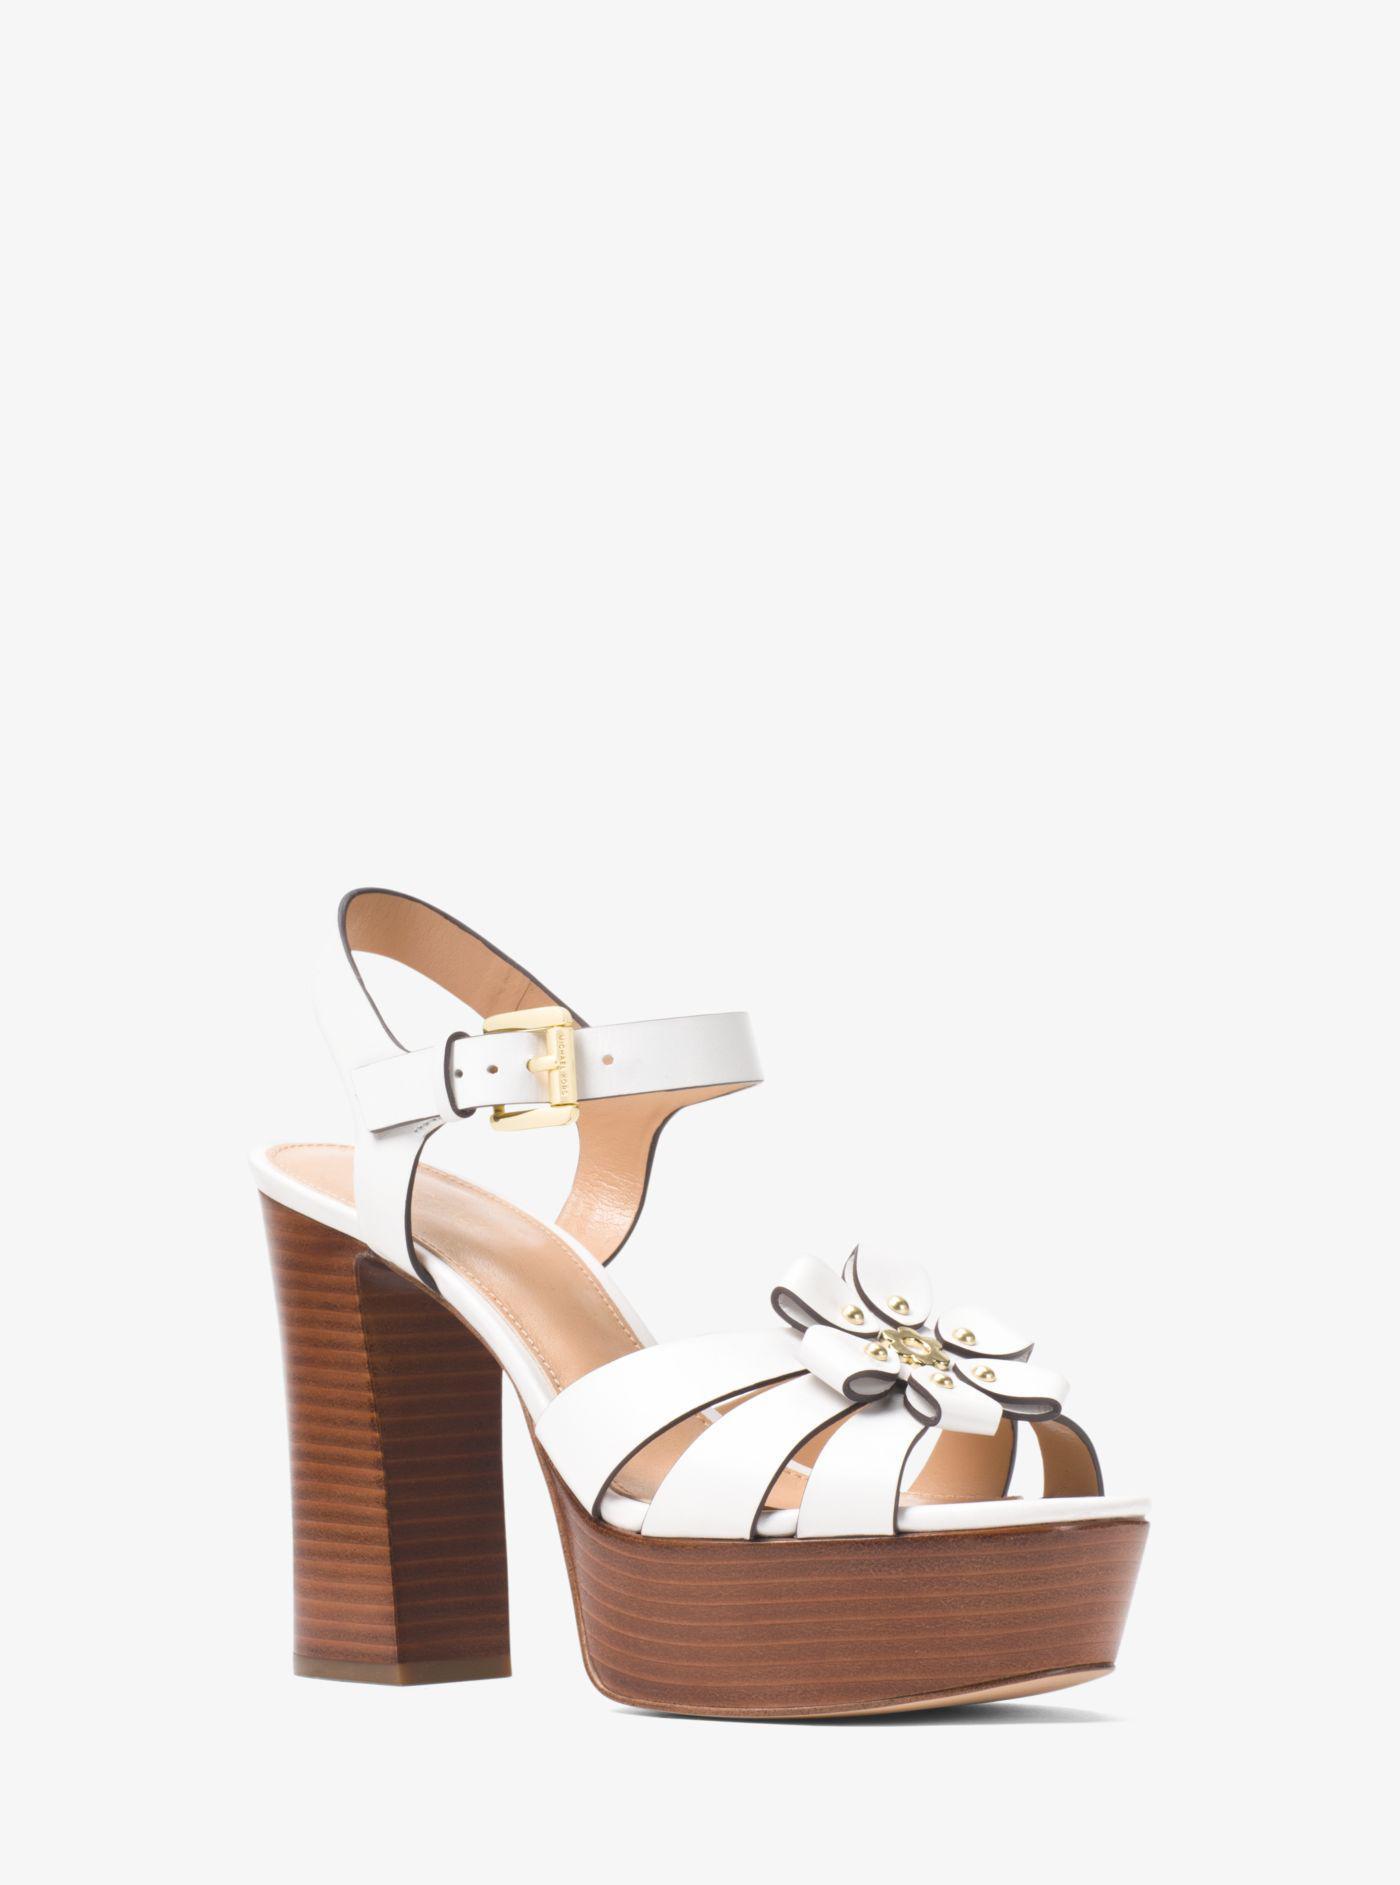 MICHAEL Michael Kors Tara Floral Applique Block Heel Platform Dress Sandals 4pMCey